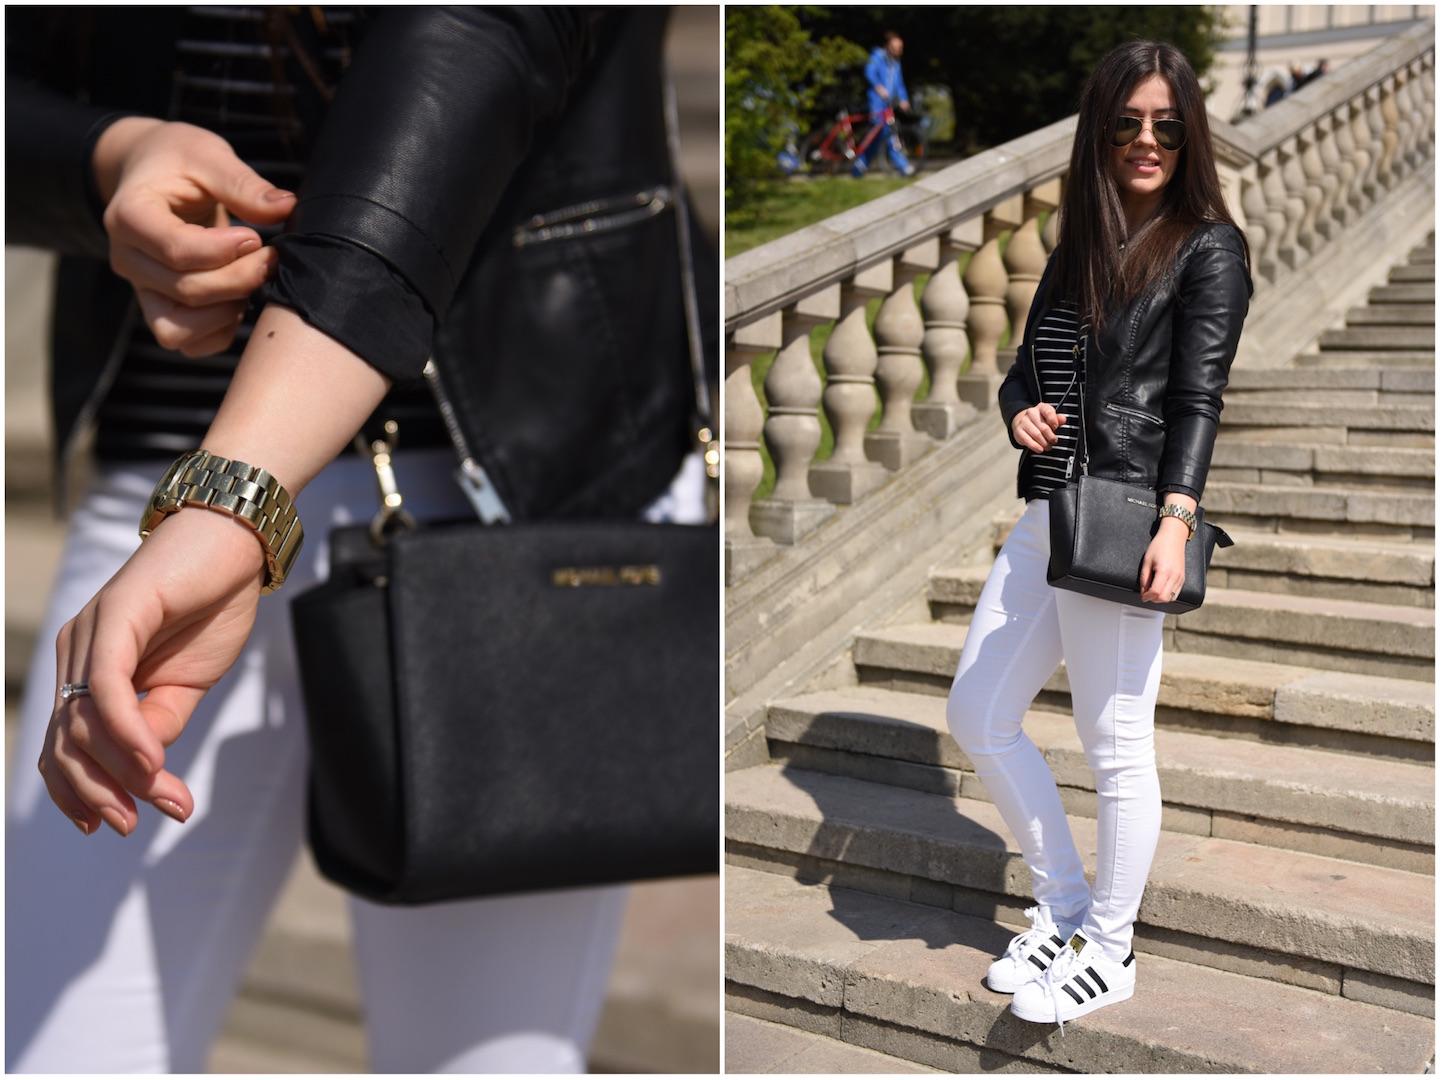 c2c645e10e830 ... torebka selma messenger · czarna ramoneska stylizacja · michael kors  selma Spodnie – Zara